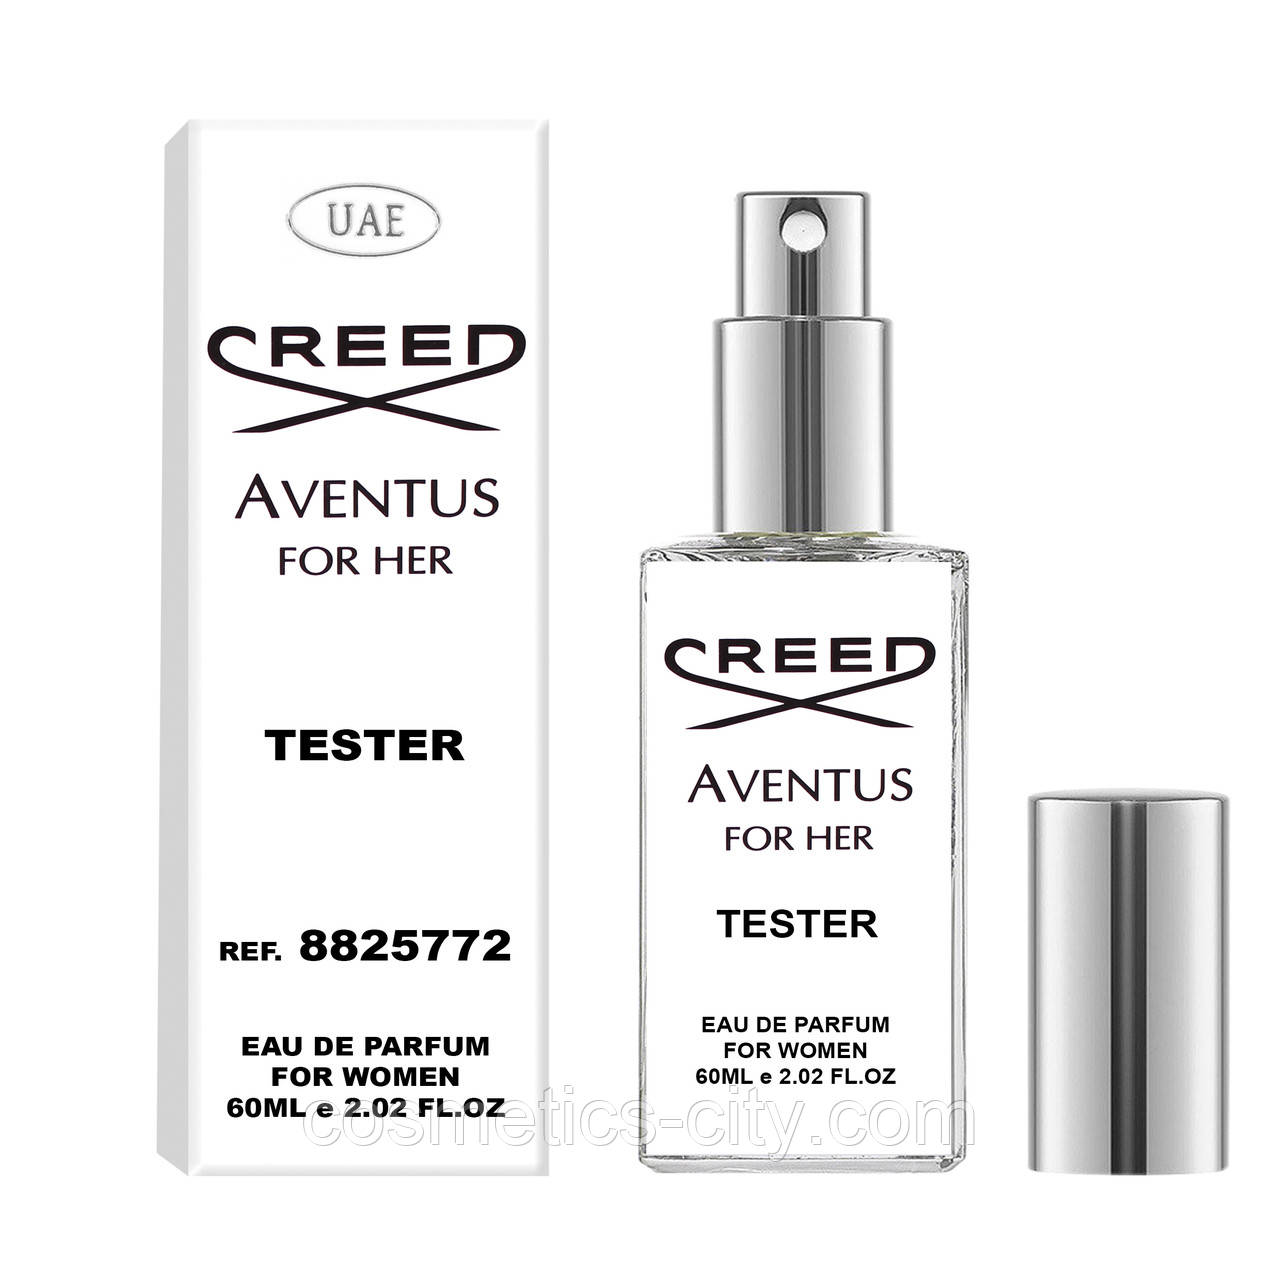 Тестер женский UAE Creed Aventus for Her, 60 мл.